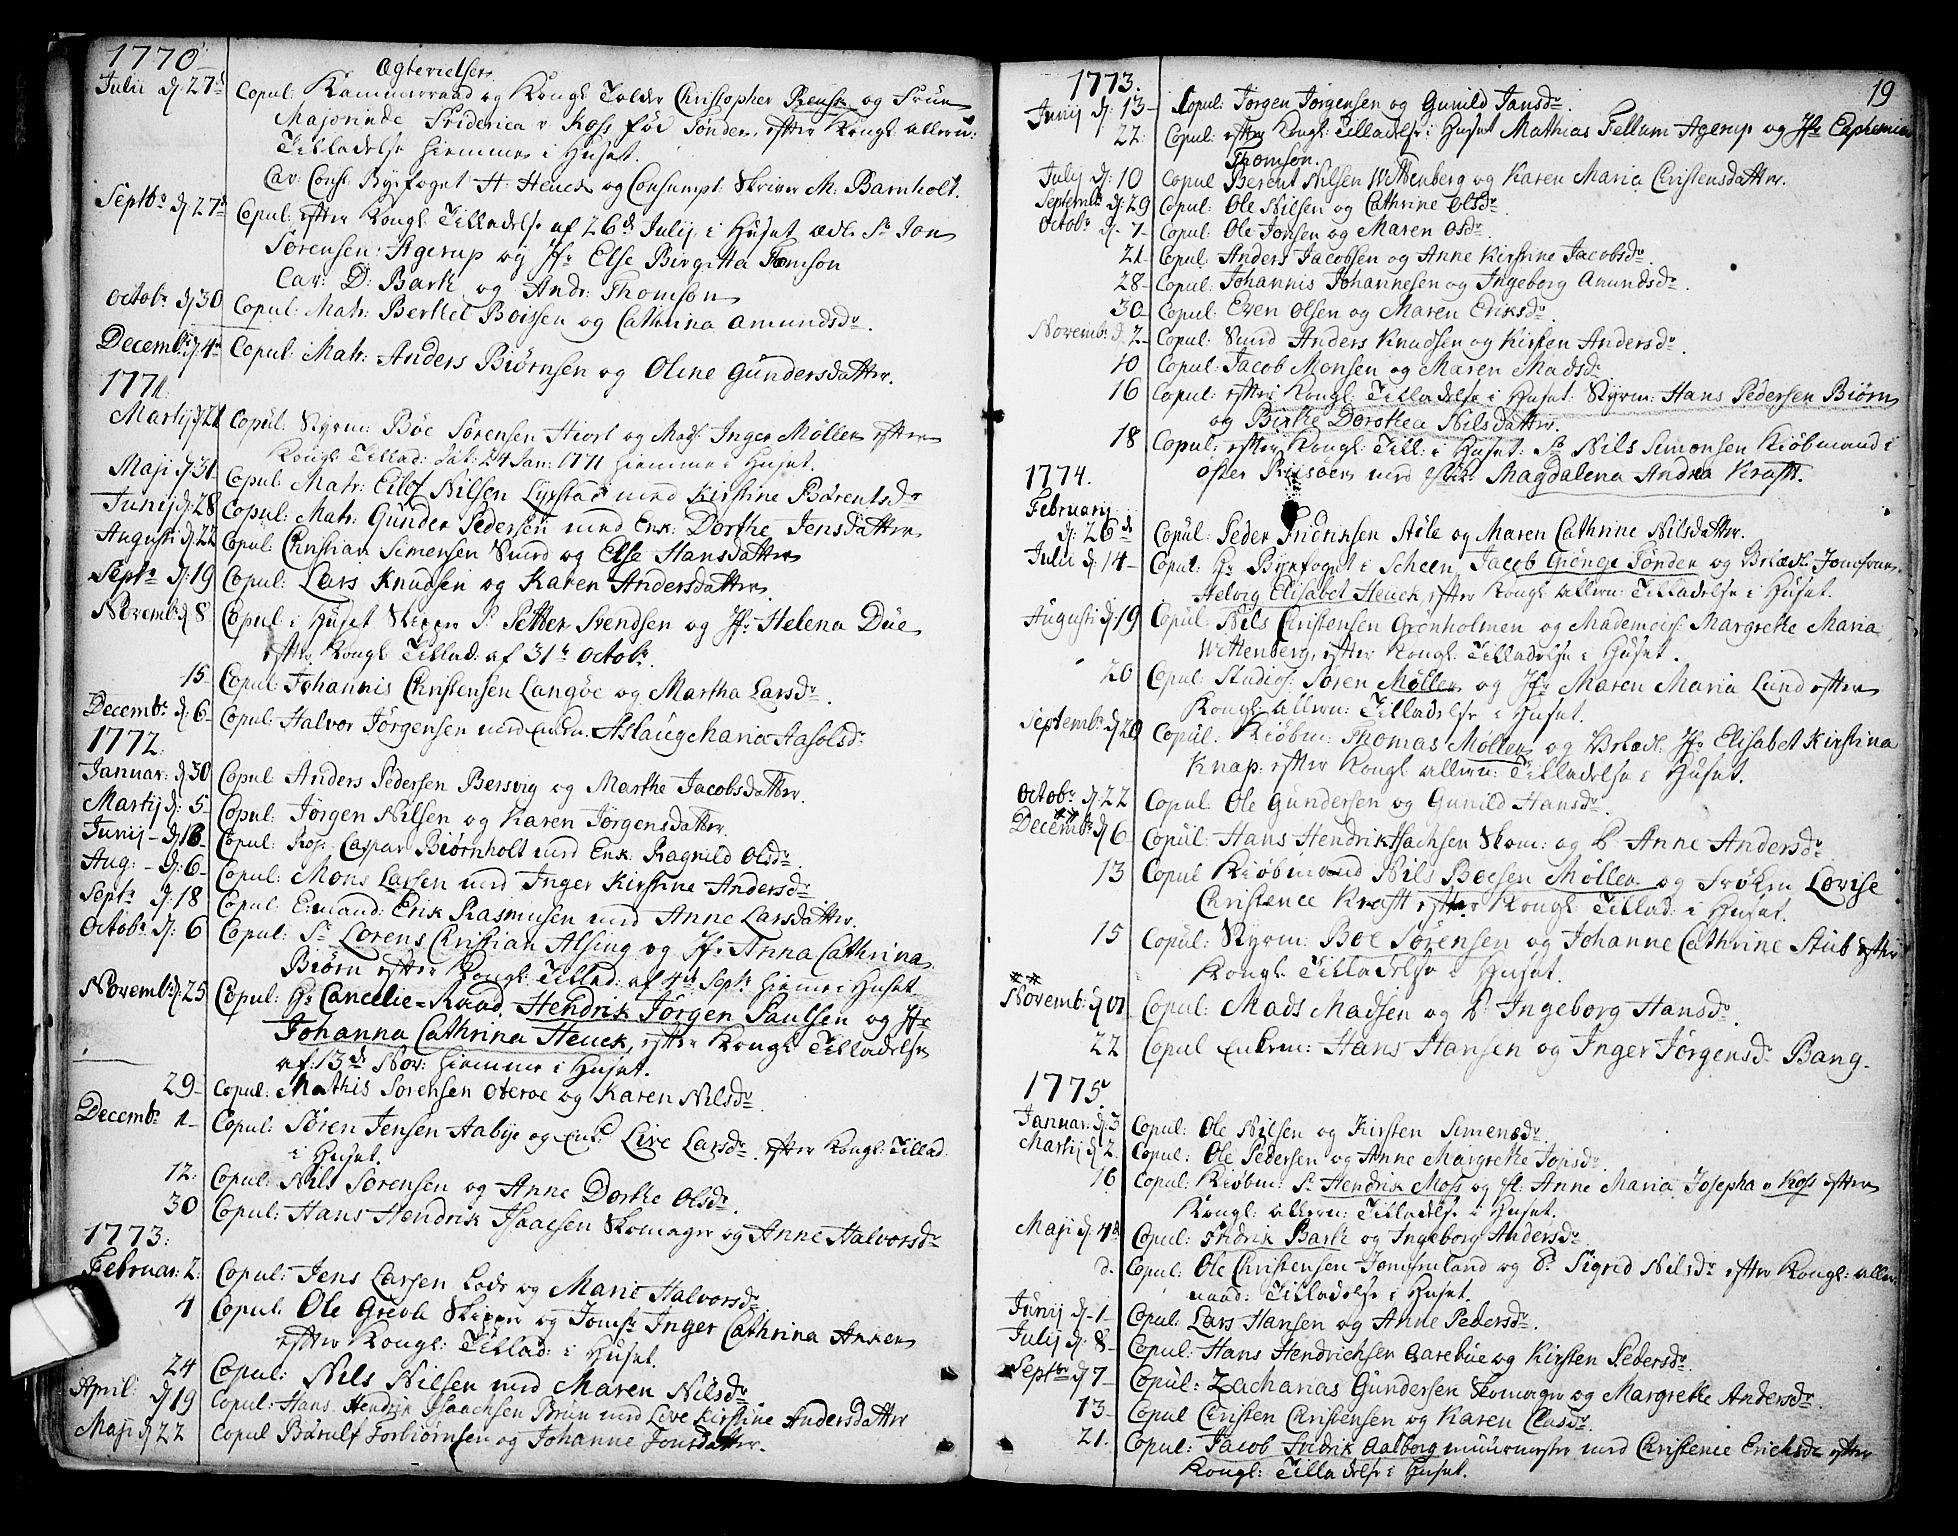 SAKO, Kragerø kirkebøker, F/Fa/L0002: Ministerialbok nr. 2, 1767-1802, s. 19